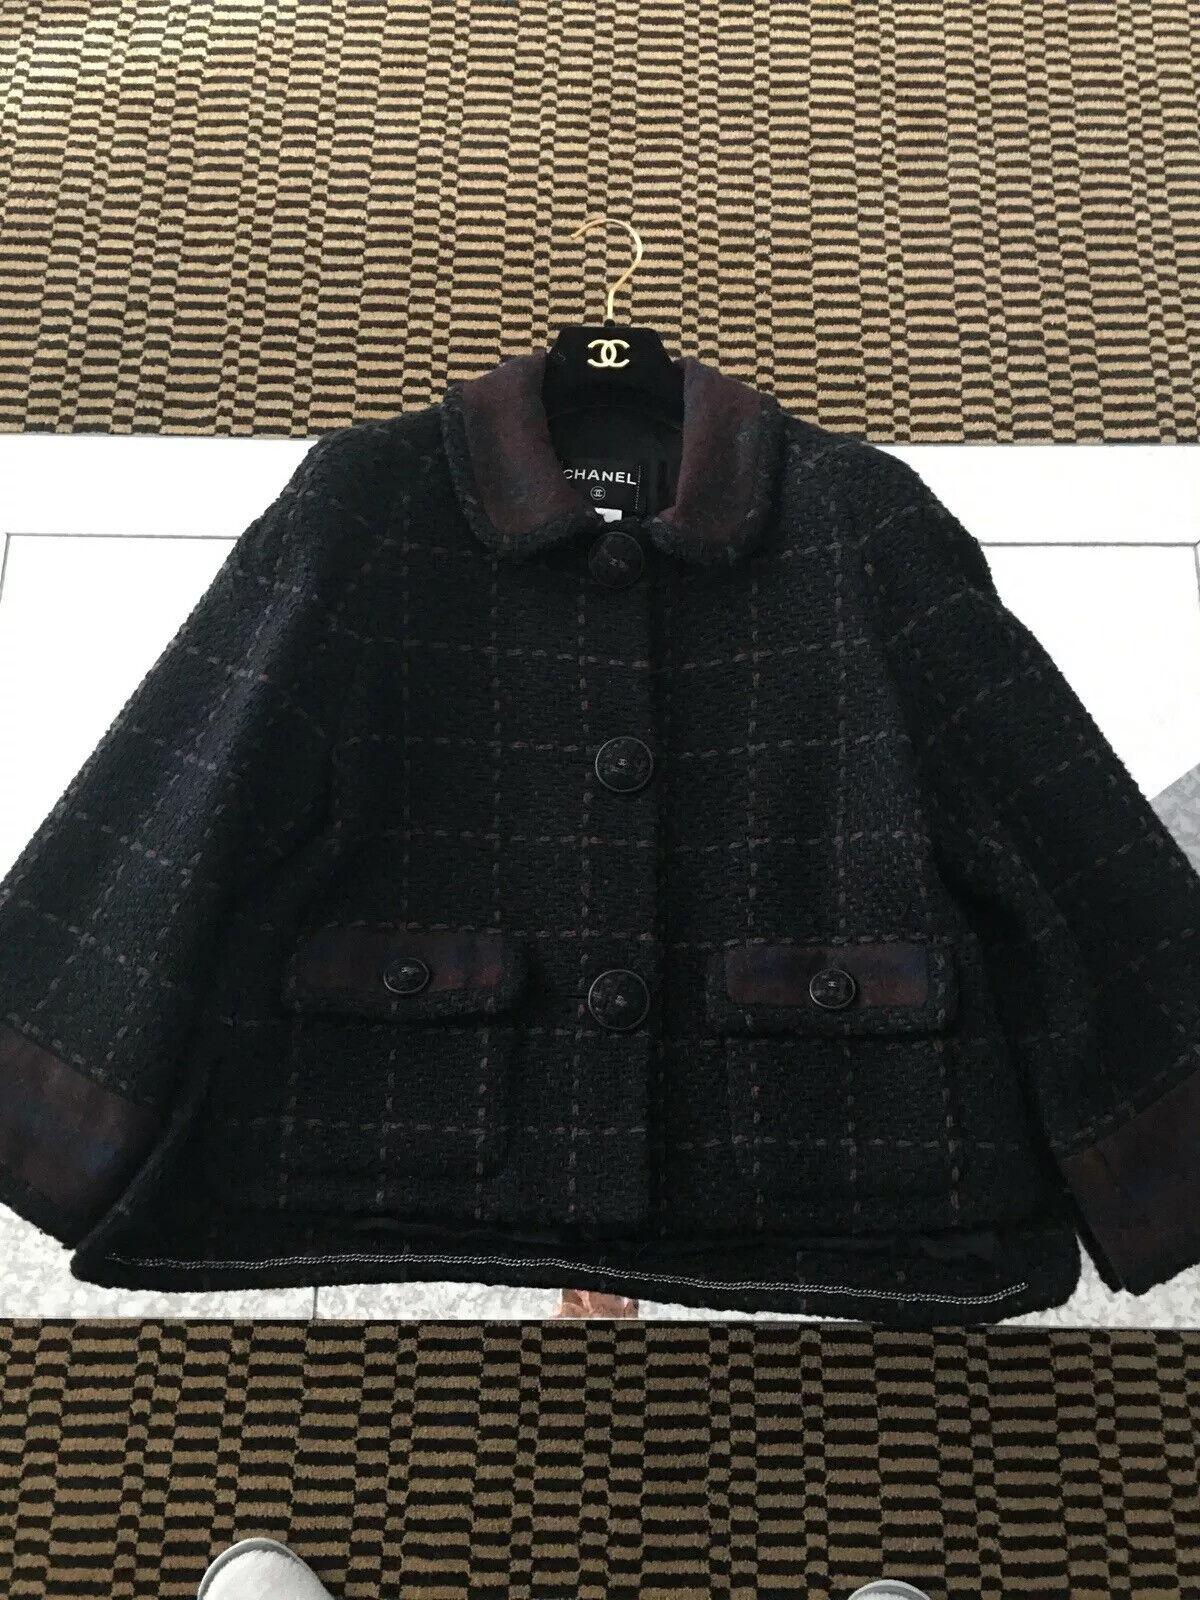 100% Authentic Chanel Jacket - image 1